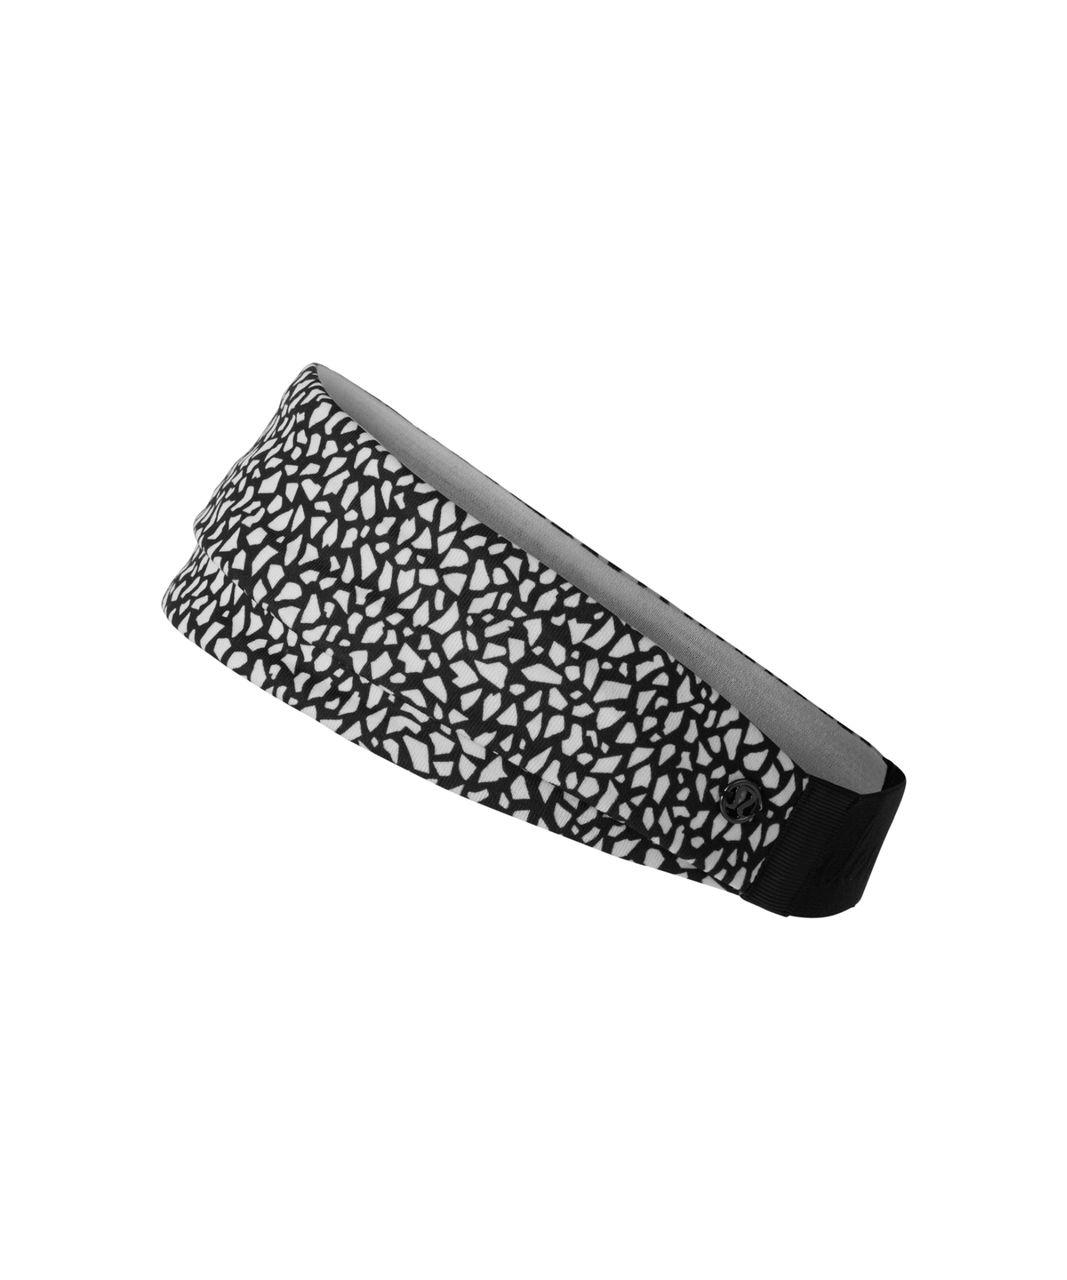 Lululemon Fringe Fighter Headband - Miss Mosaic Black / White / Black